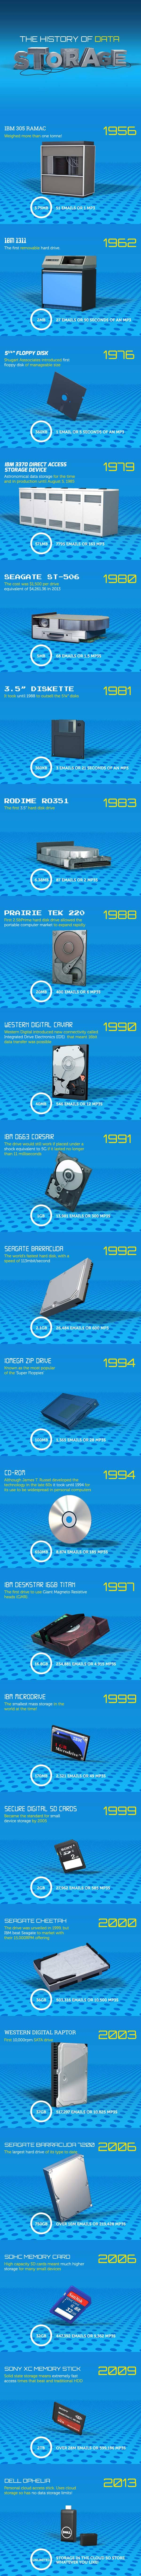 storage_infographic_full